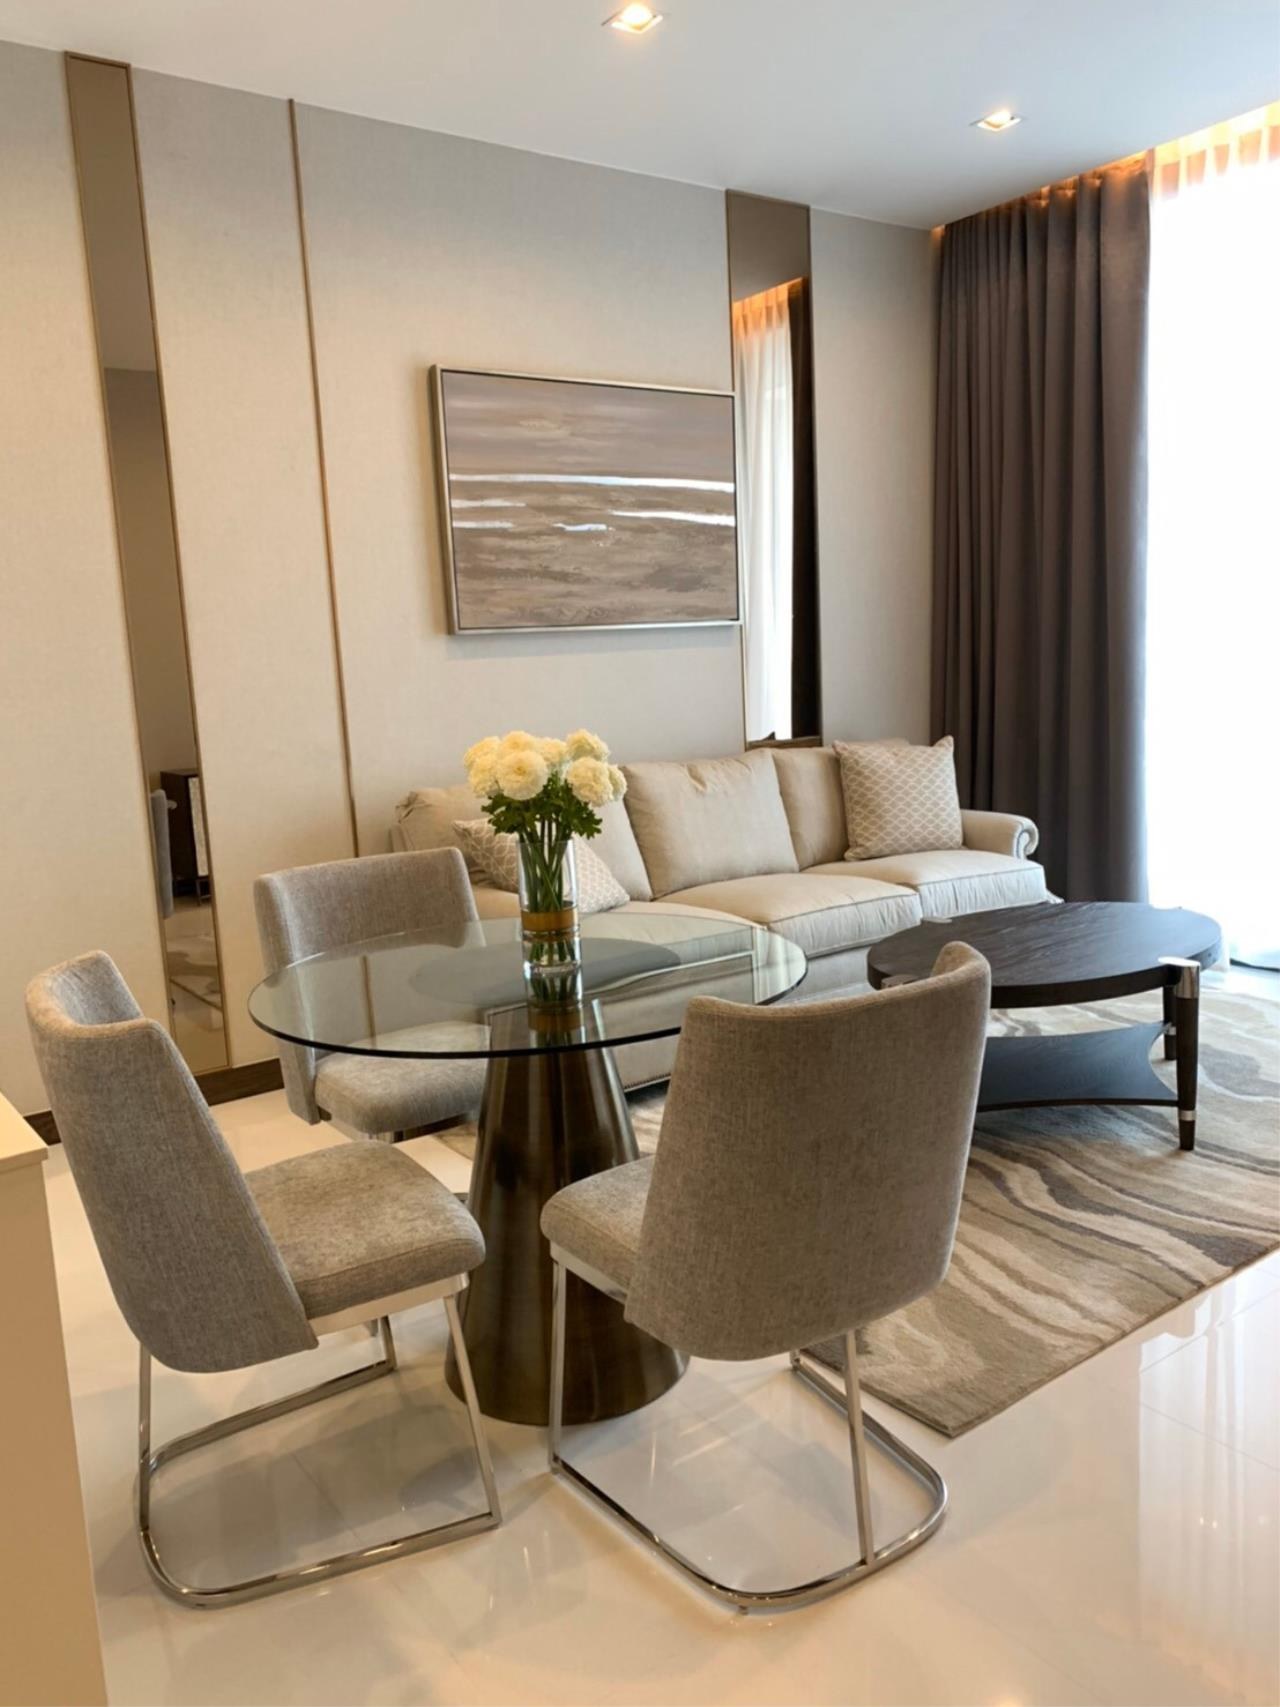 Bestbkkcondos Agency's Q sukhumvit at BTSnana - 92sqm - For Rent : 90 000 / month - 2 Bedrooms 12